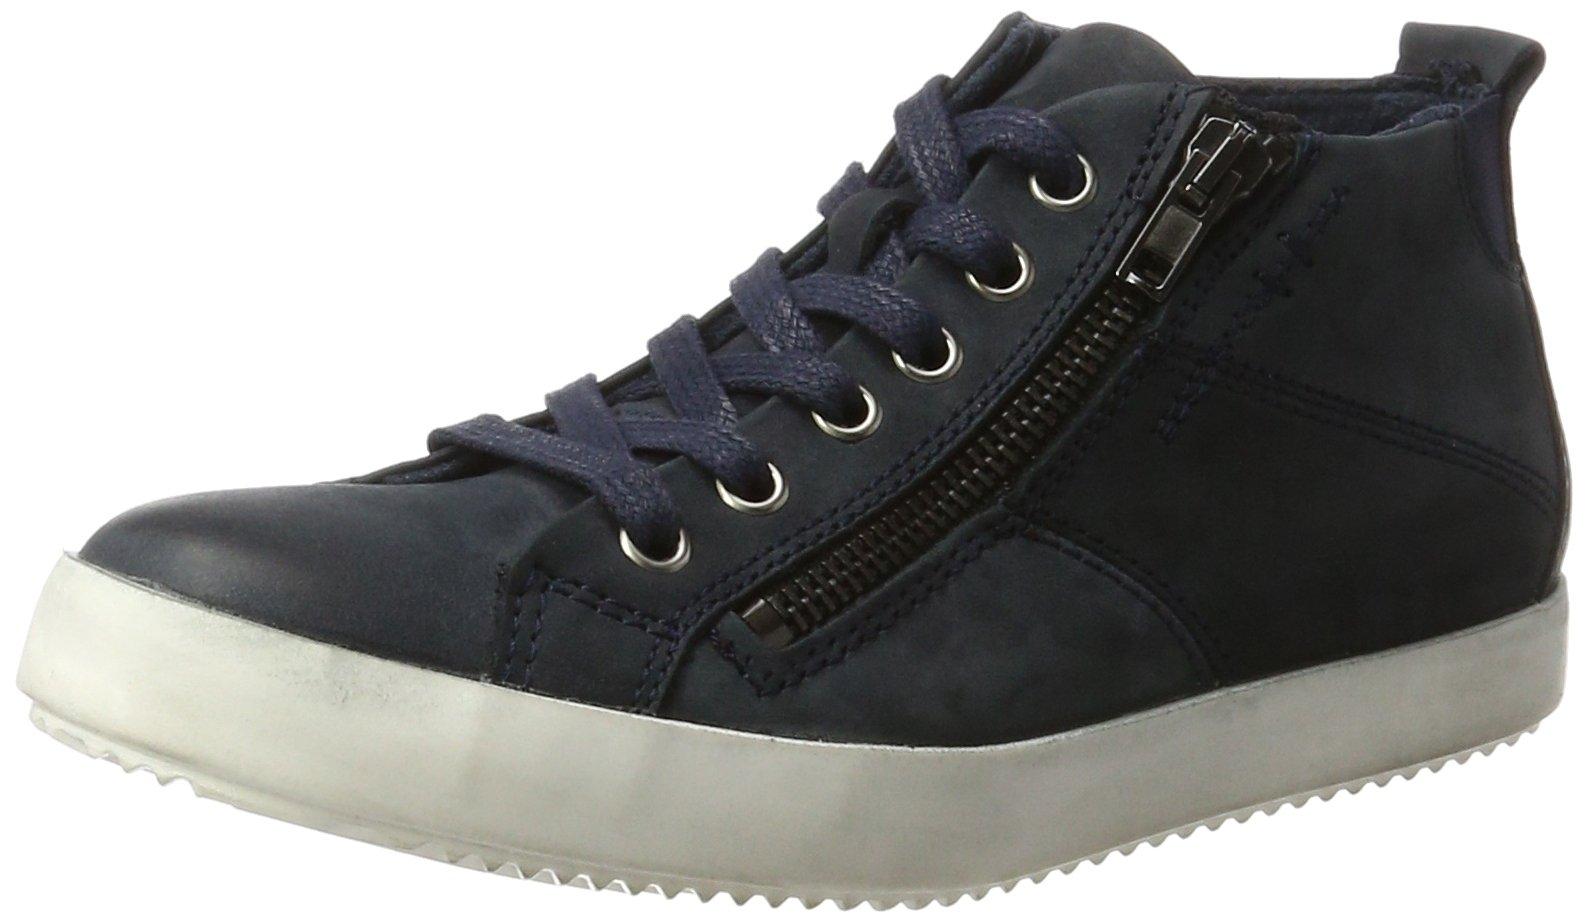 Tamaris Eu 25295Sneakers Hautes 80542 FemmeBleunavy kuPZOXi